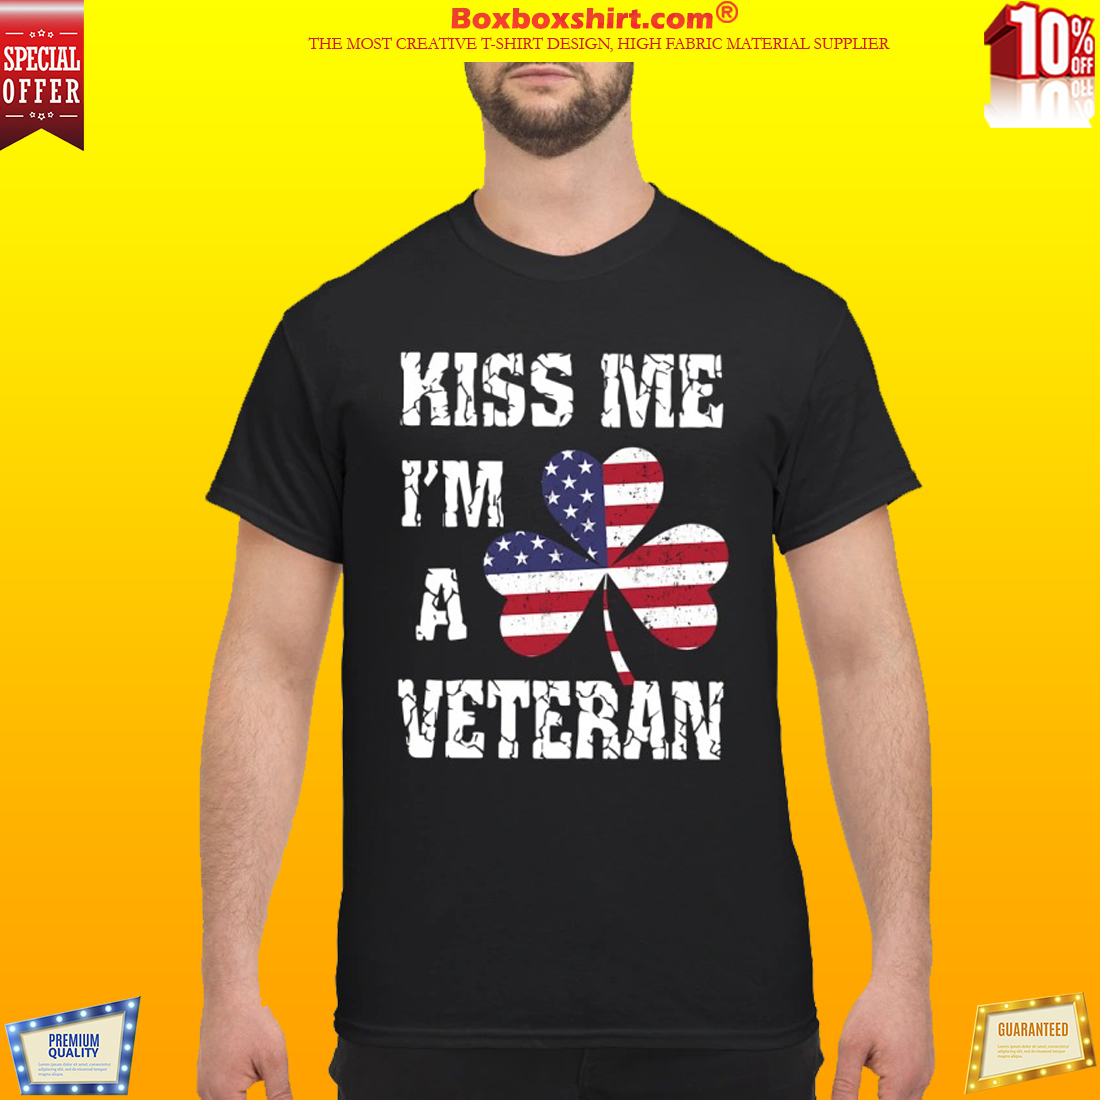 Kiss me I'm a Veteran classic shirt